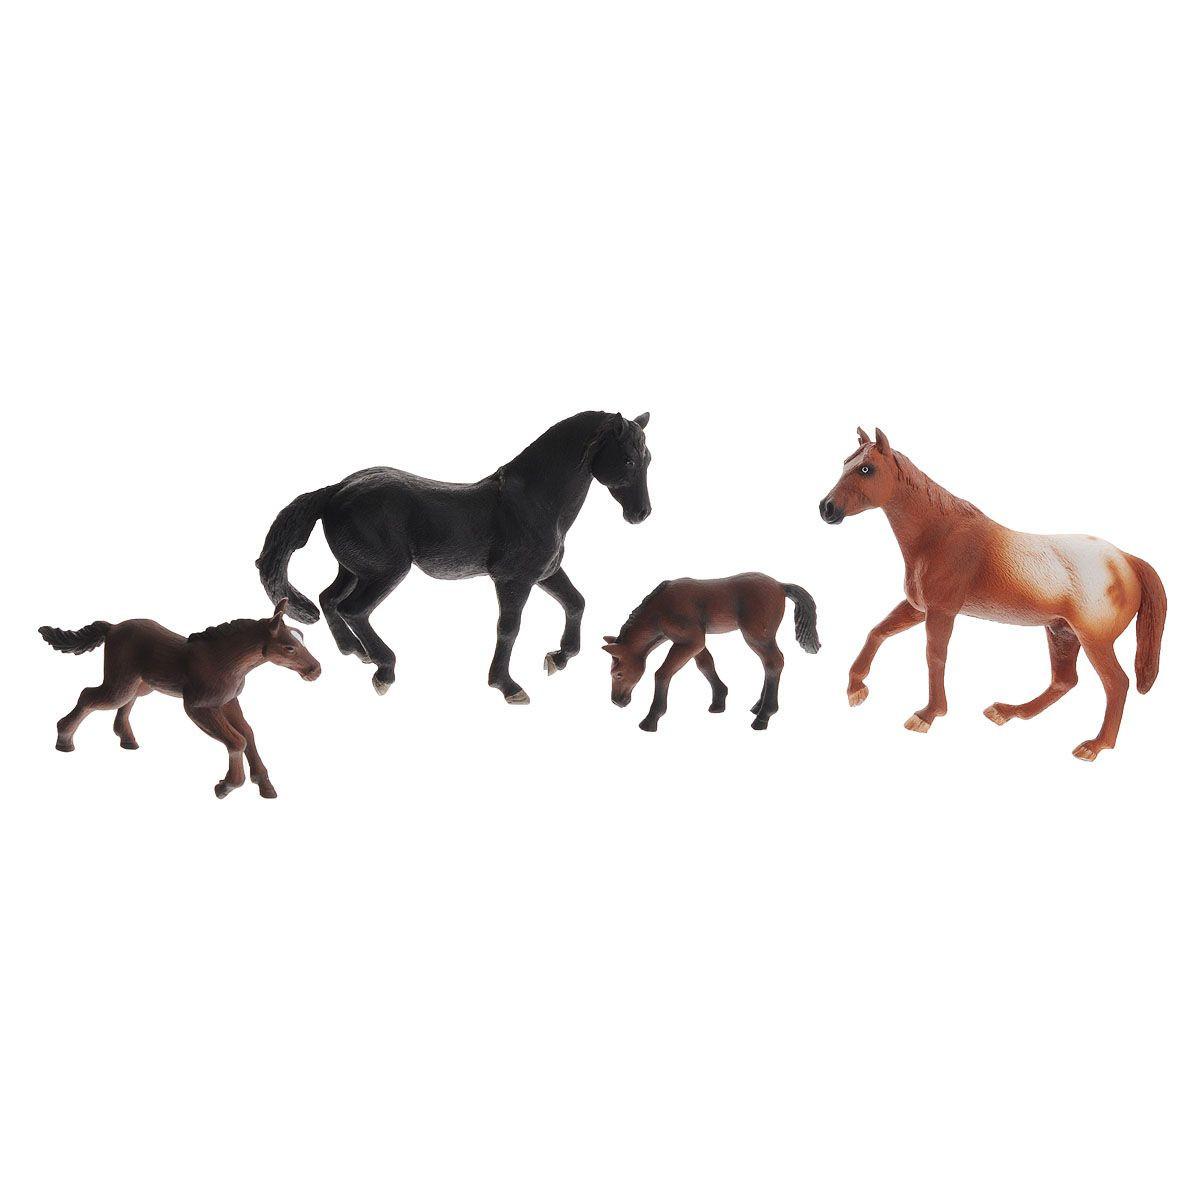 Набор Animal Planet – Лошади, 4 штуки - Фигурки животных, артикул: 162528